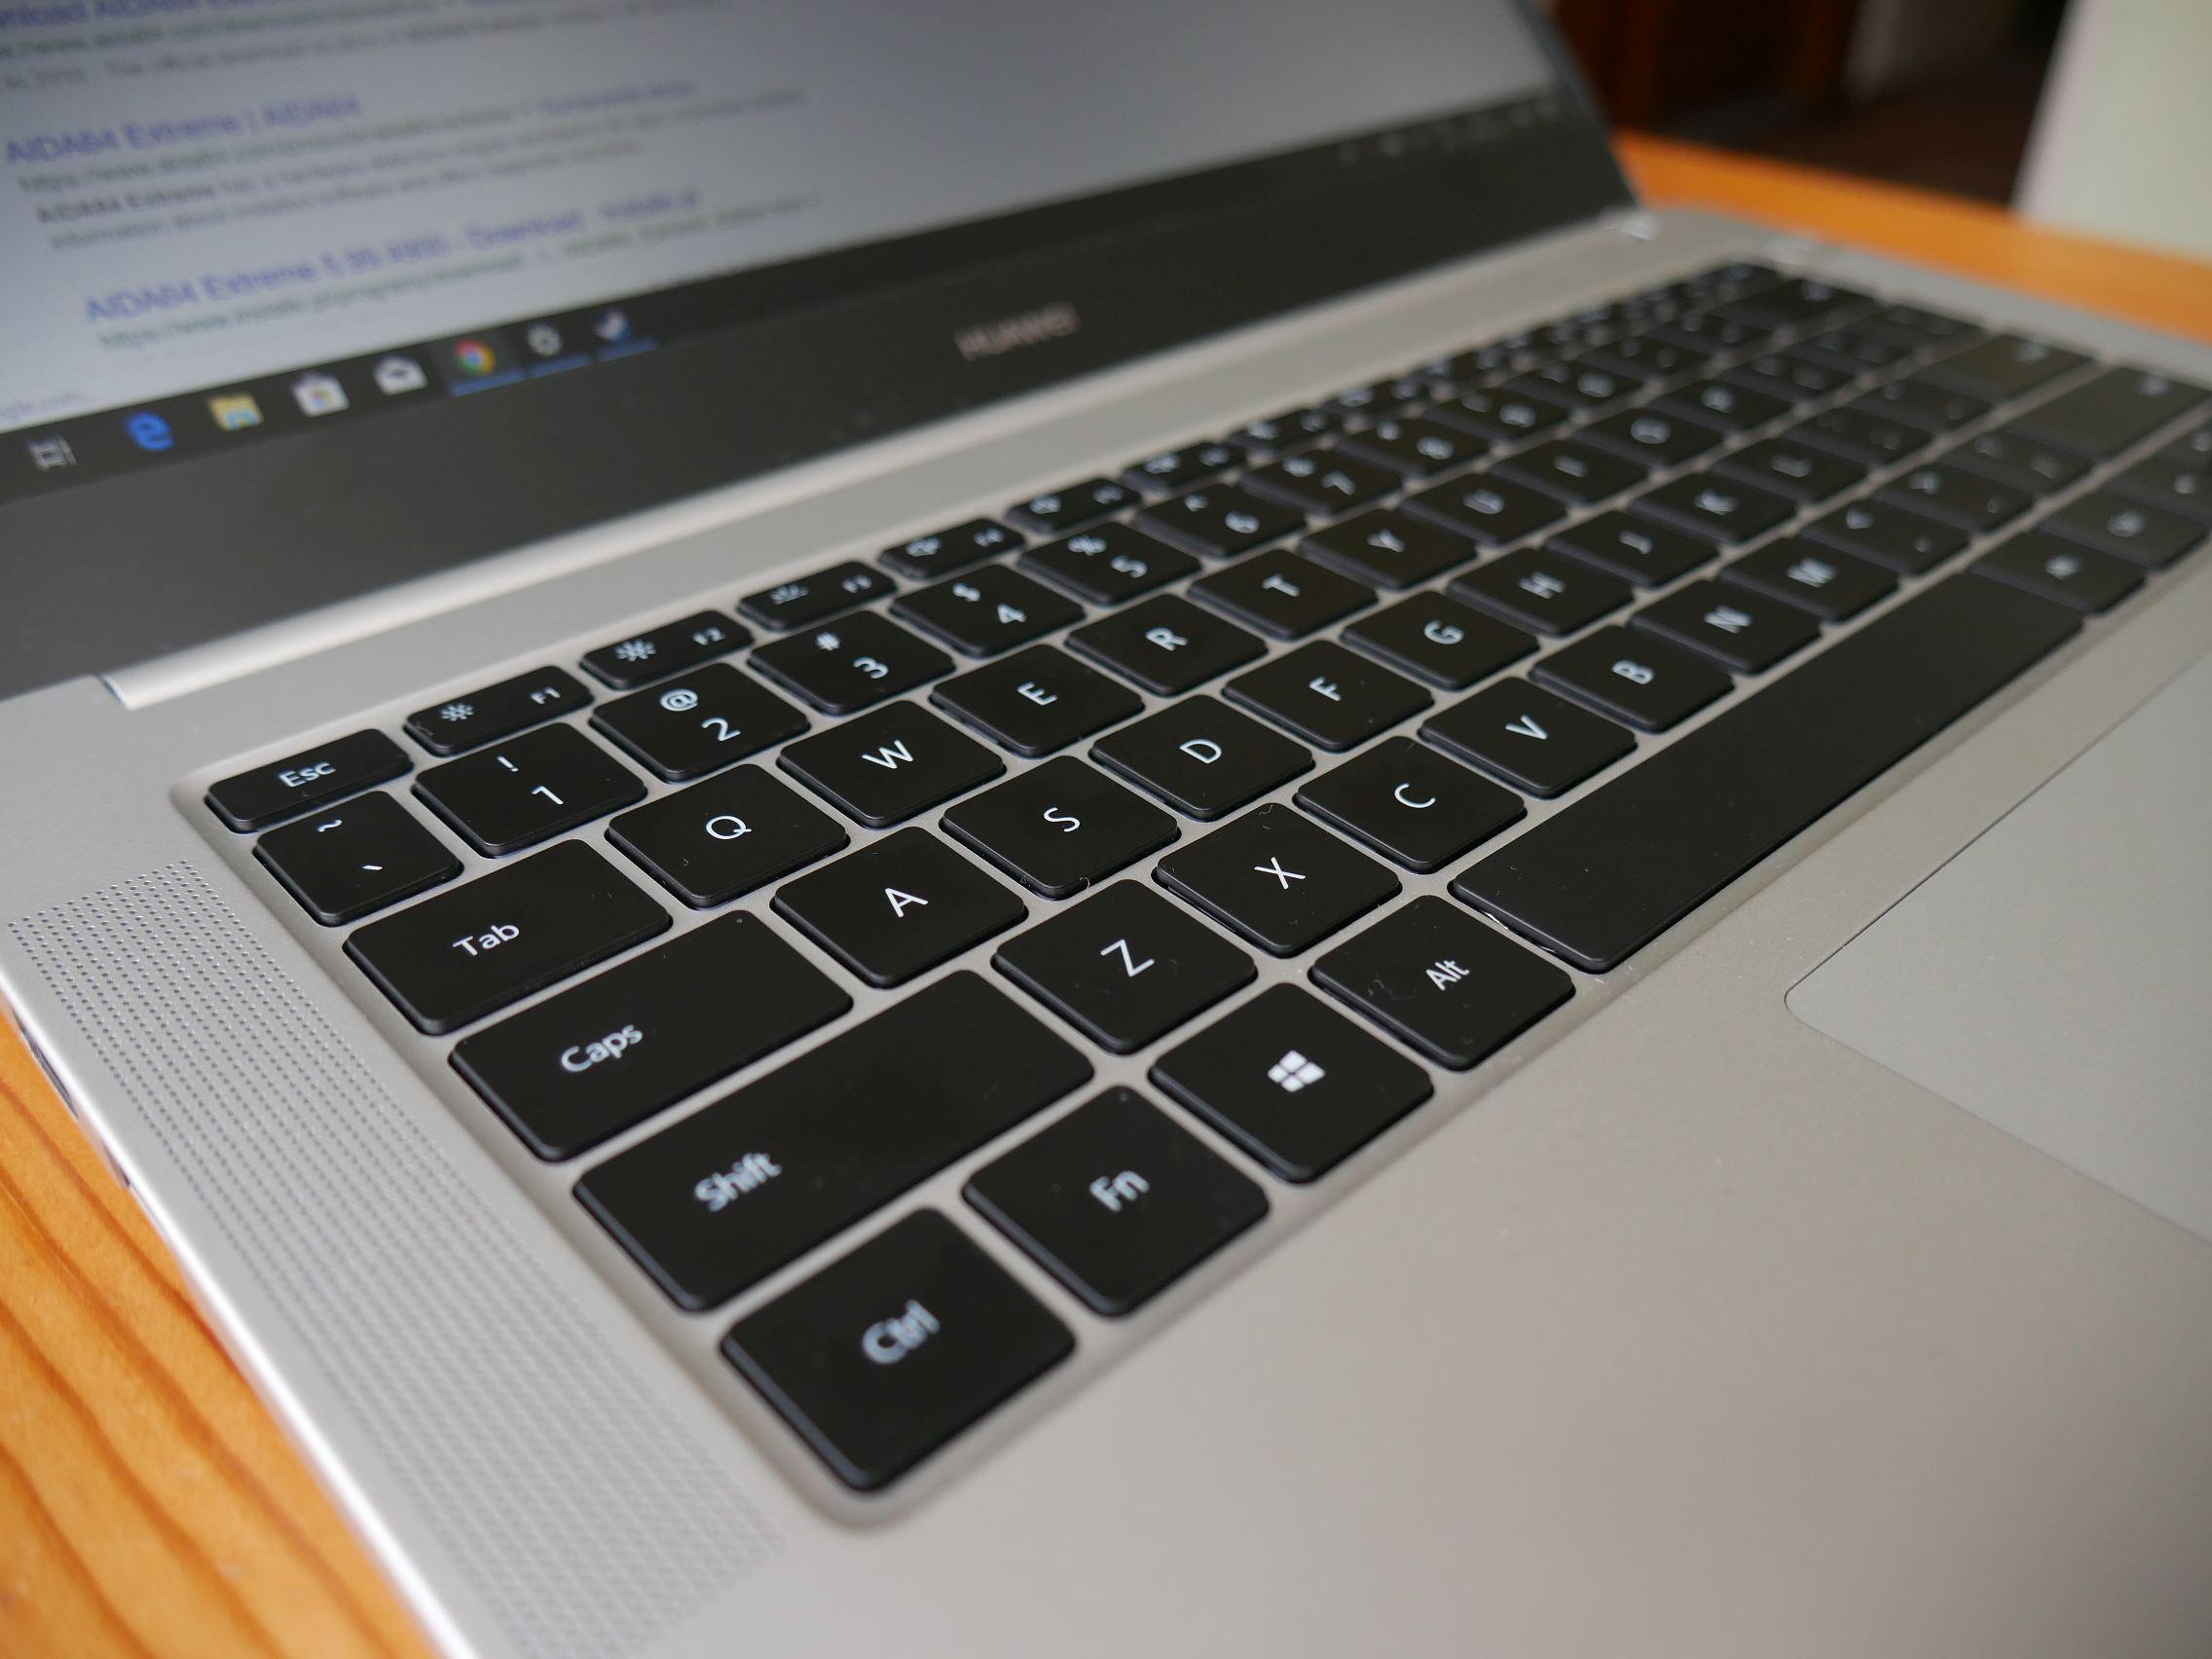 Tani Macbook z Windowsem  Recenzja Huawei Matebook D 14